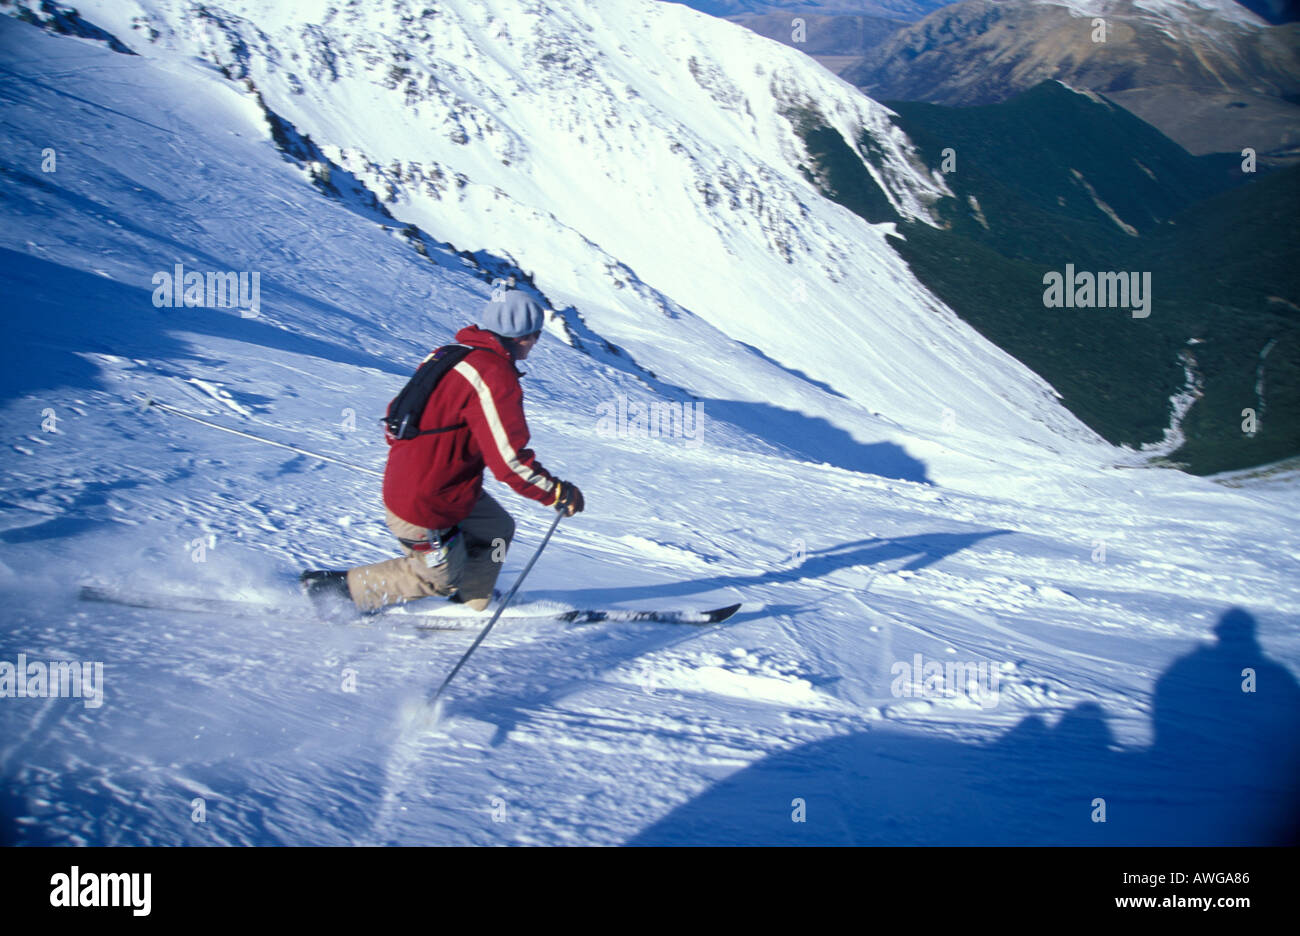 Telemark skier dropping into Middle Basin at Craigieburn Ski Field Canterbury New Zealand - Stock Image